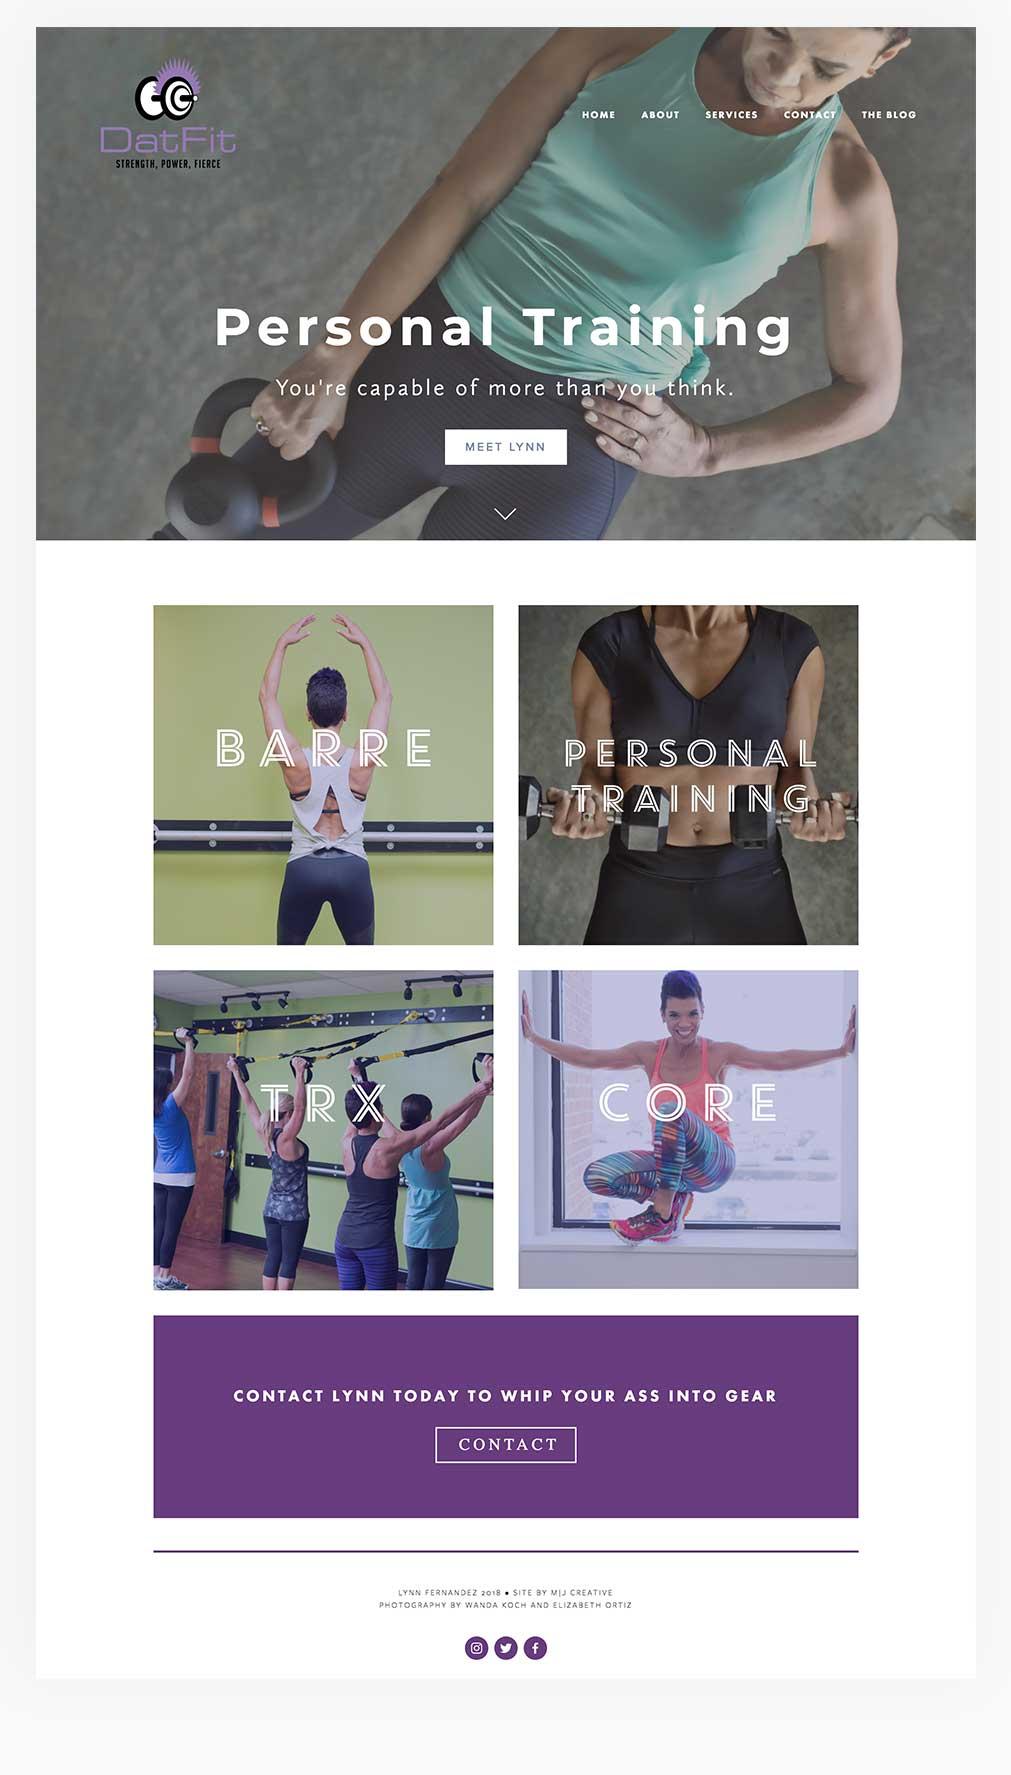 personal-training-web-design-charlotte.jpg